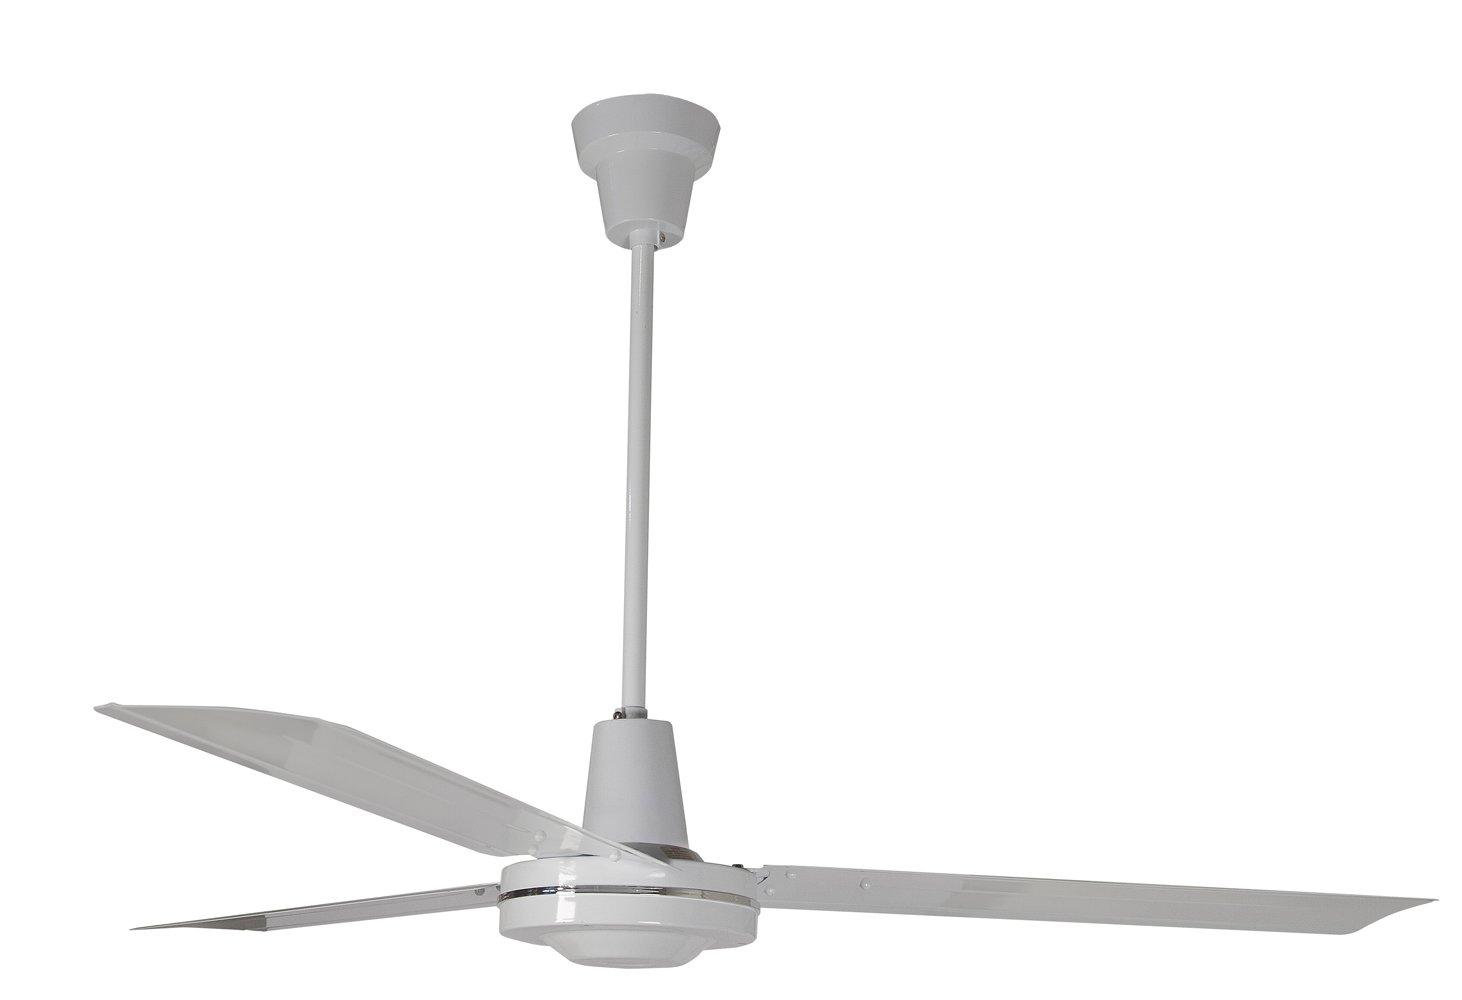 Leading Edge 60001 60-Inch Heavy Duty High Performance Ceiling Fan, 46000 CFM, White